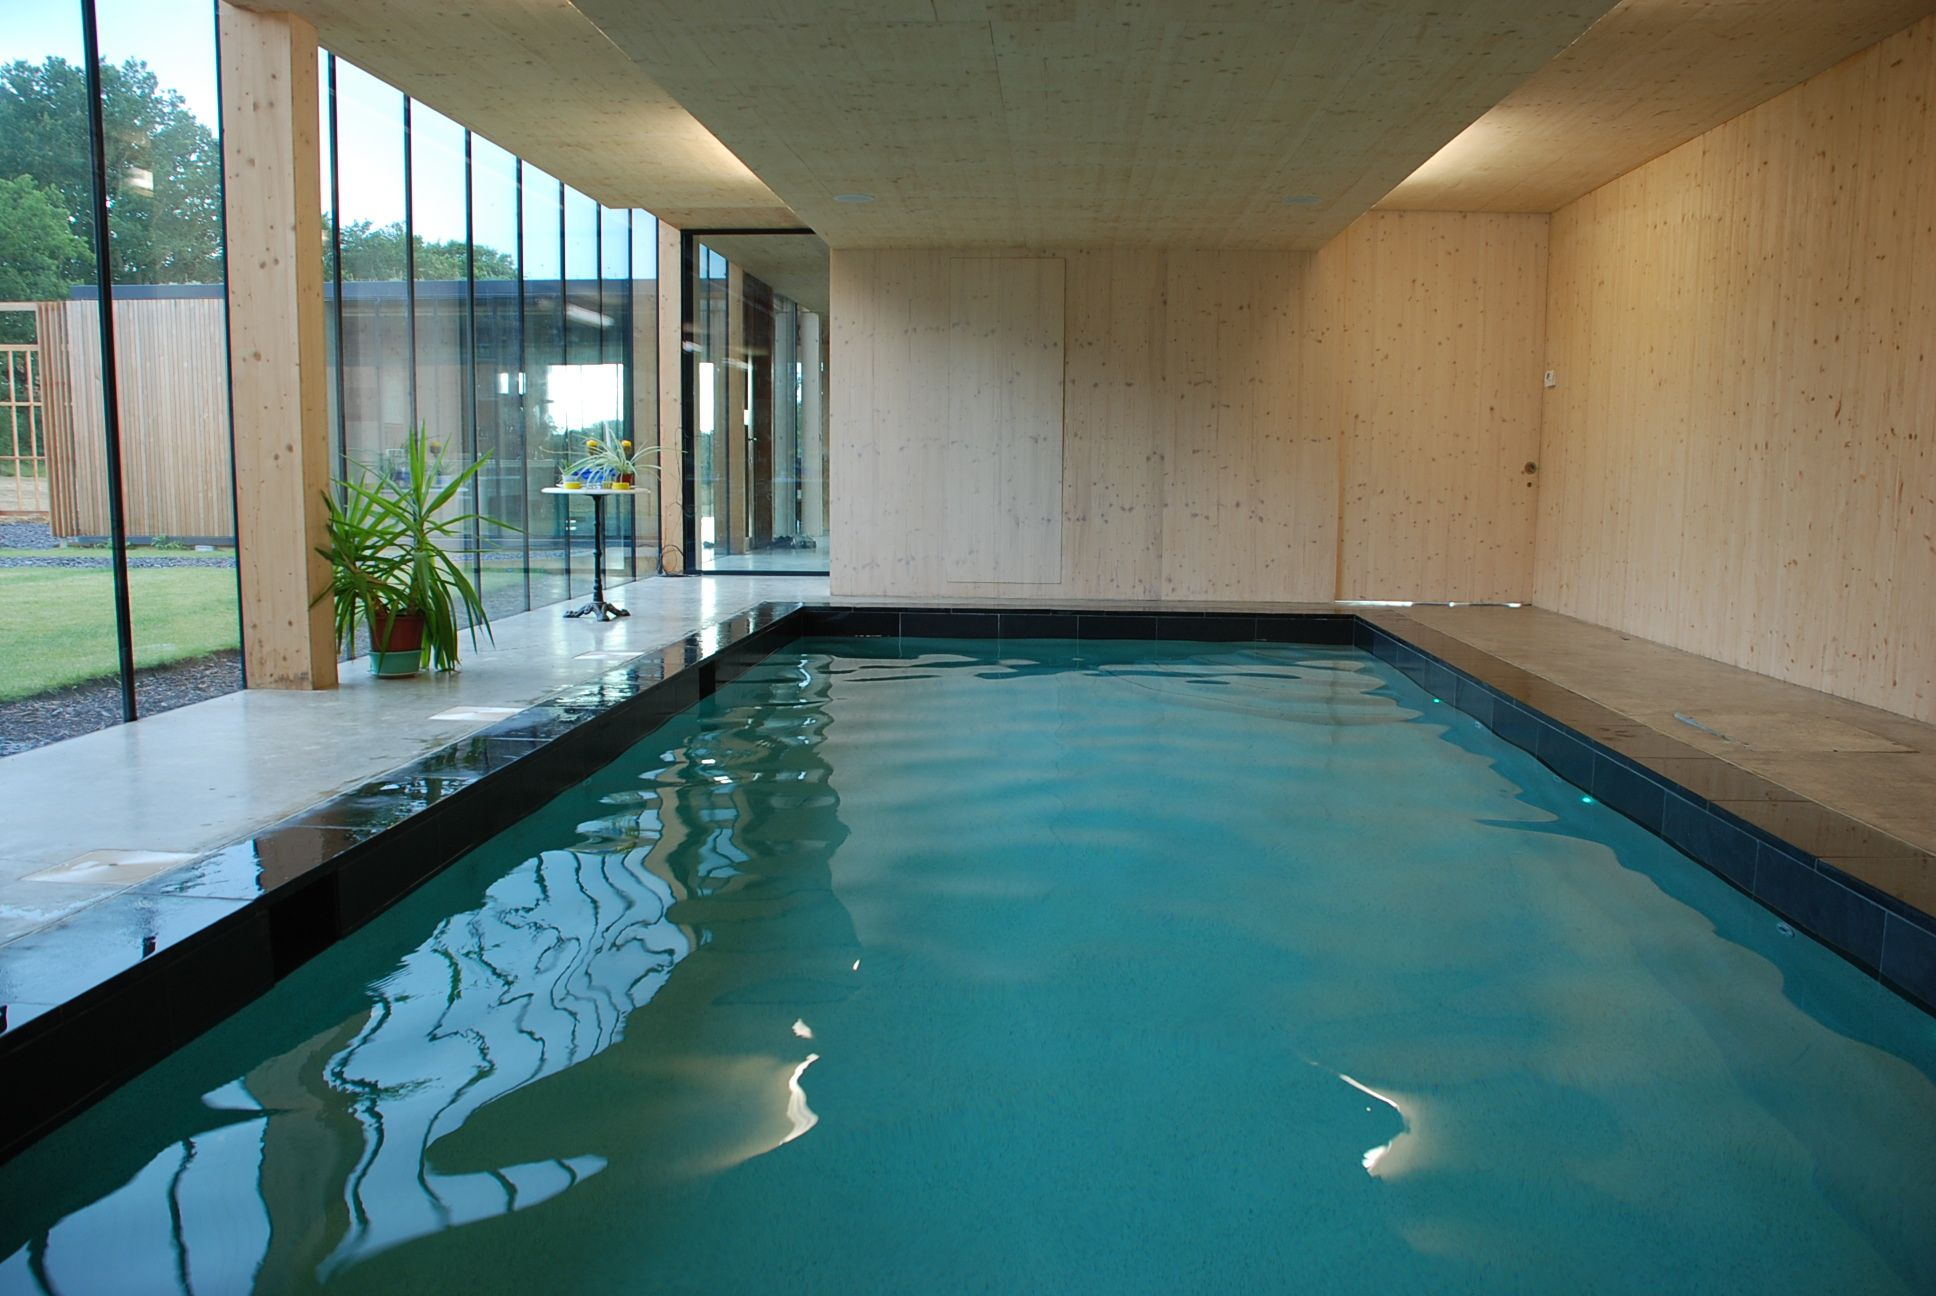 Swimming pool installation phoenix - #Installation Check more at ...